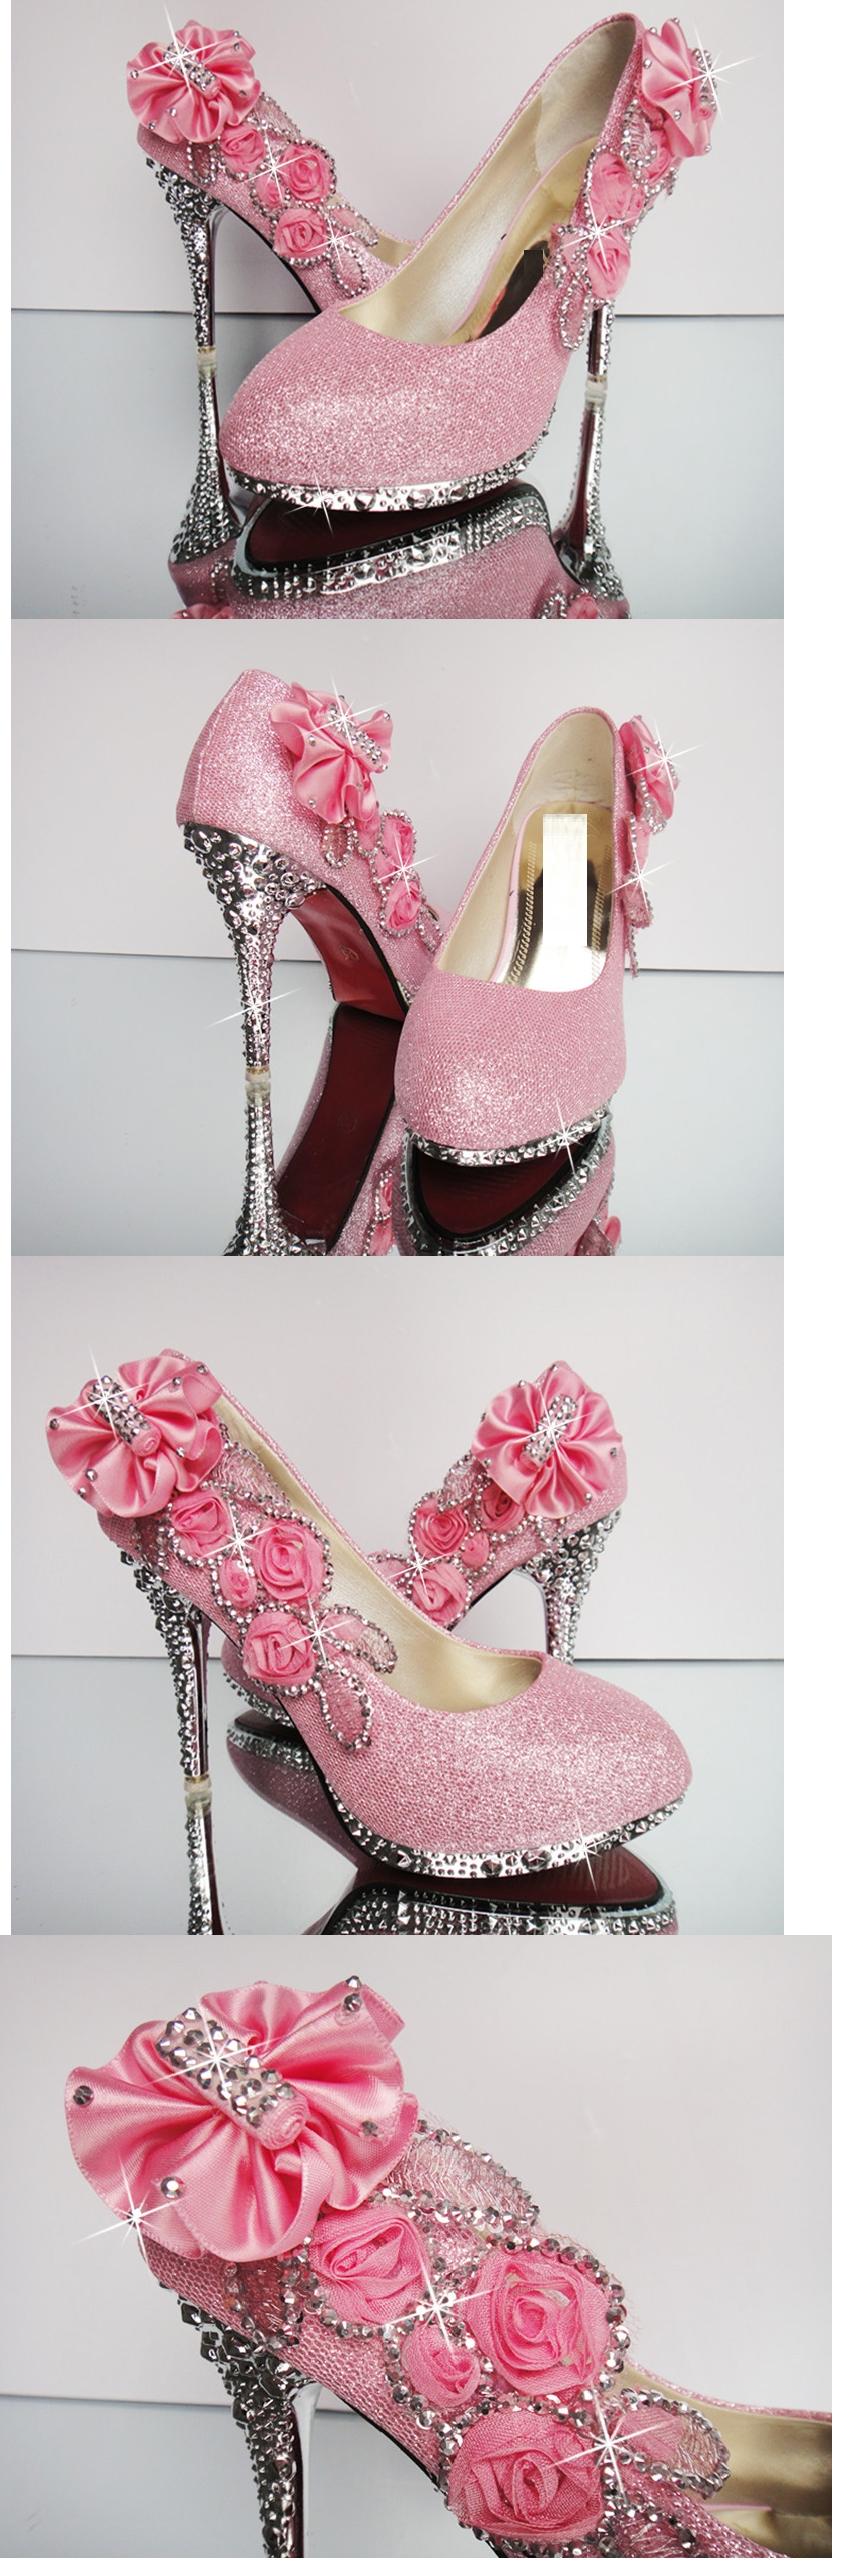 I'm a Barbie Girl....